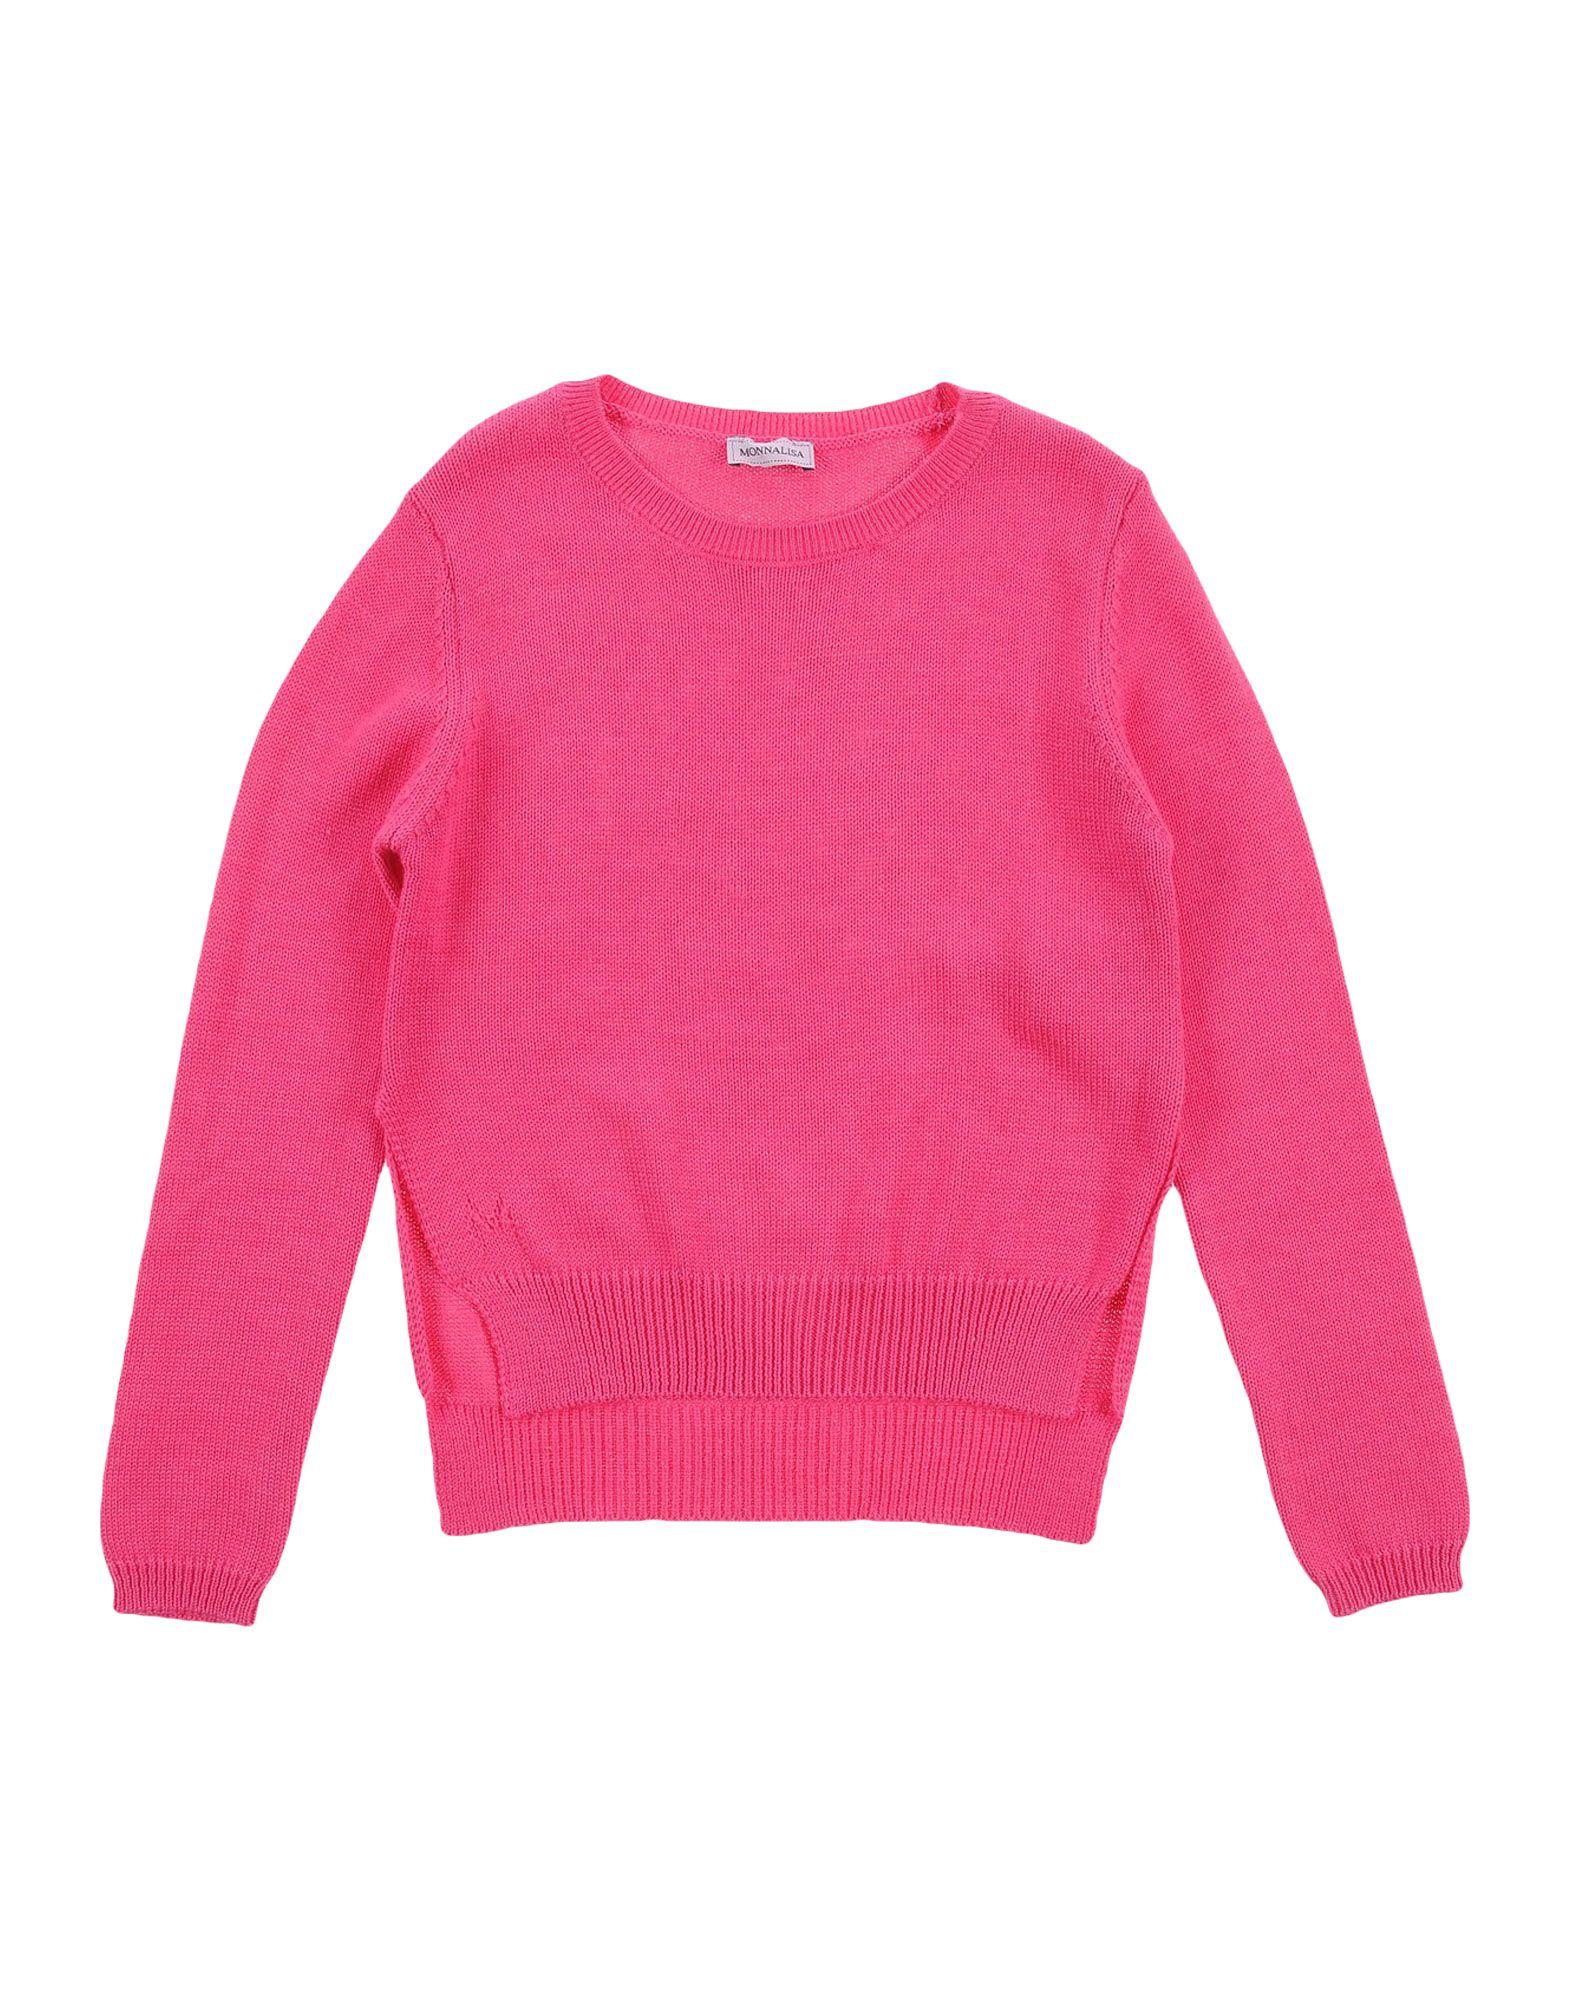 MONNALISA Sweater in Fuchsia